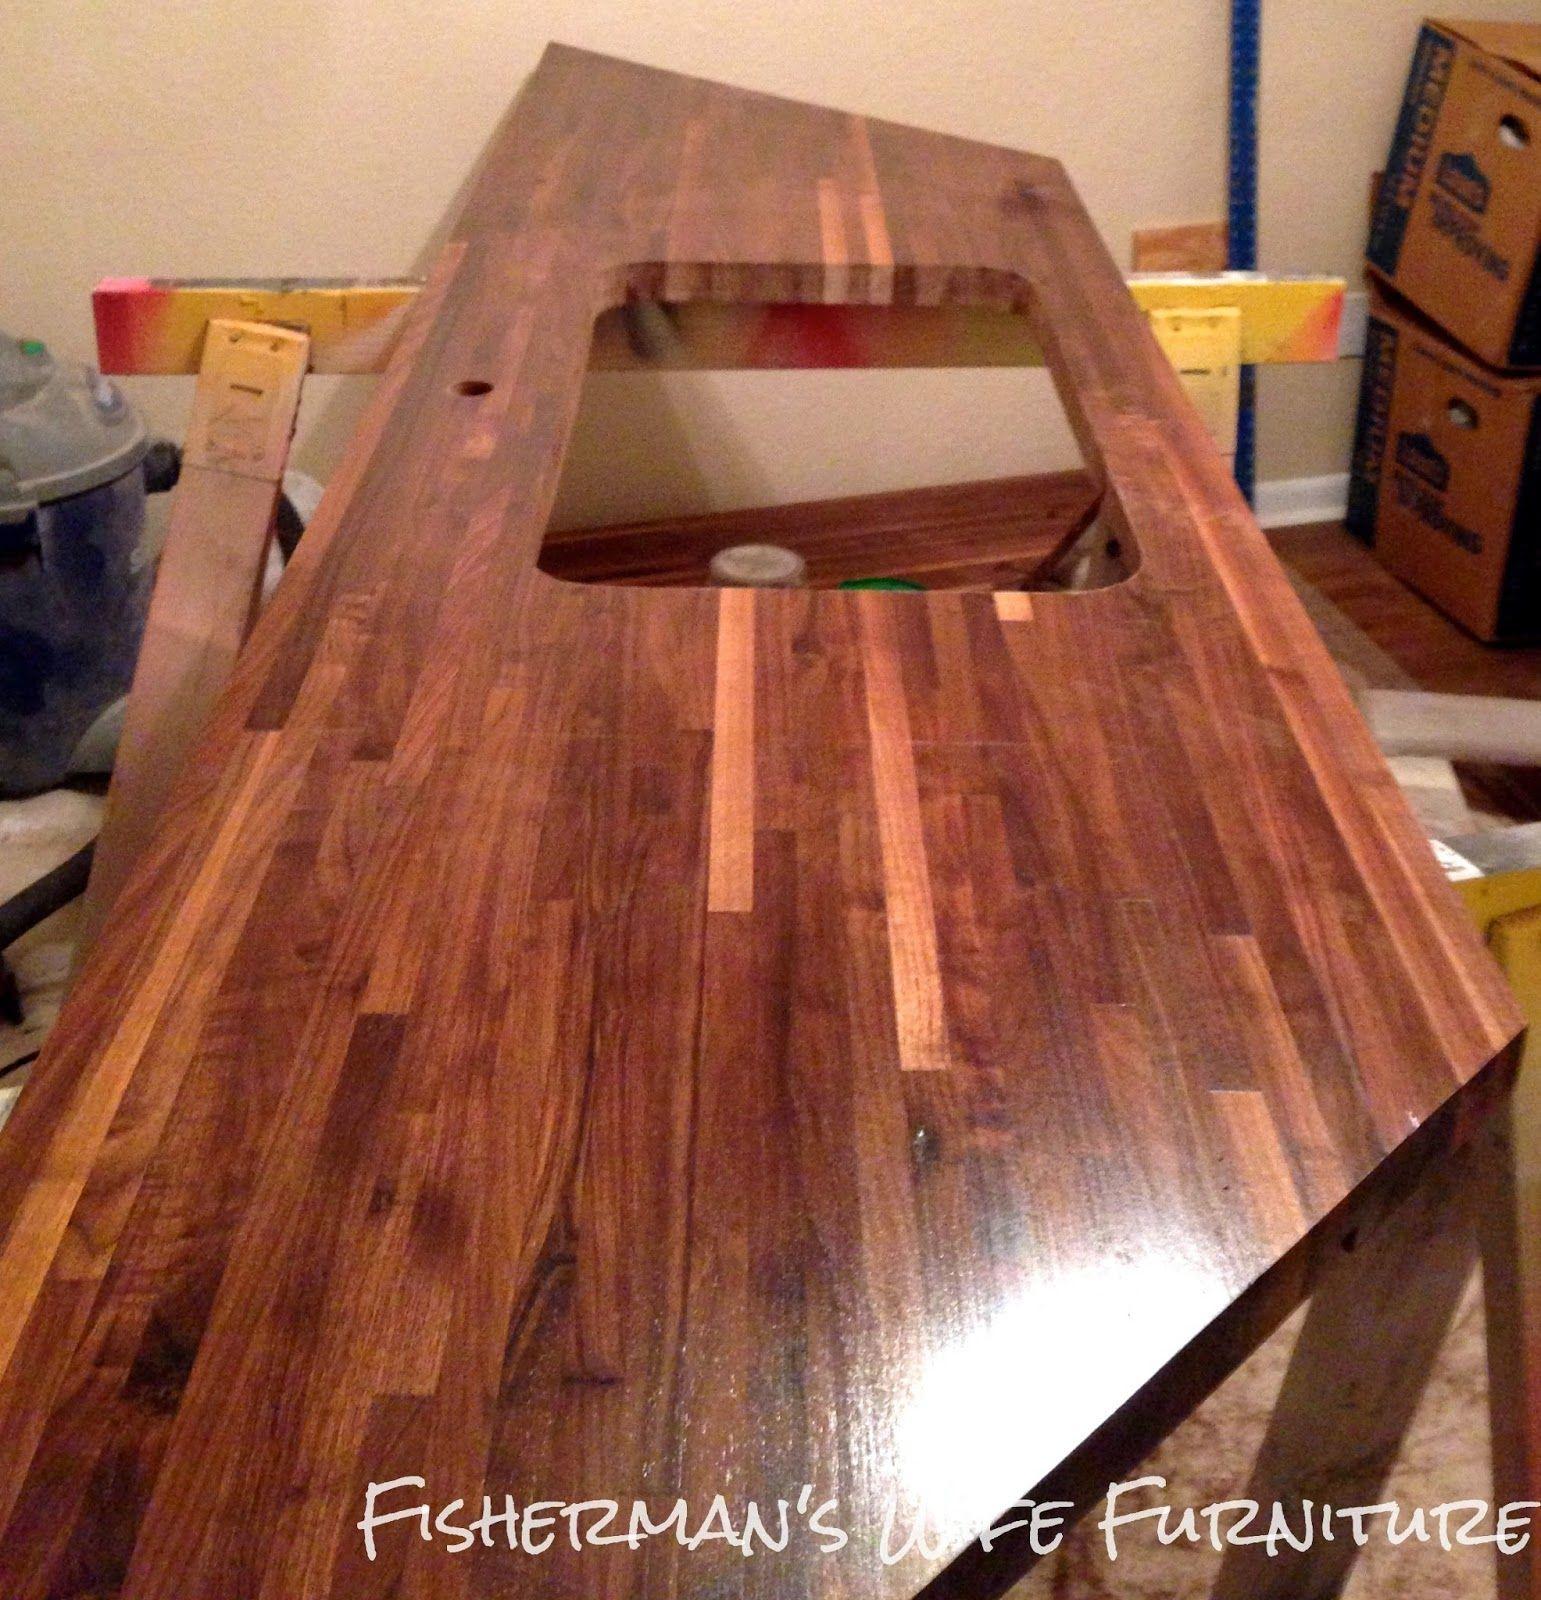 Fisherman S Wife Furniture Diy Butcher Block Countertops Installation Tutorial For Lumber Liquidators Counters Plus I Hadn T Thought Of Going This Dark